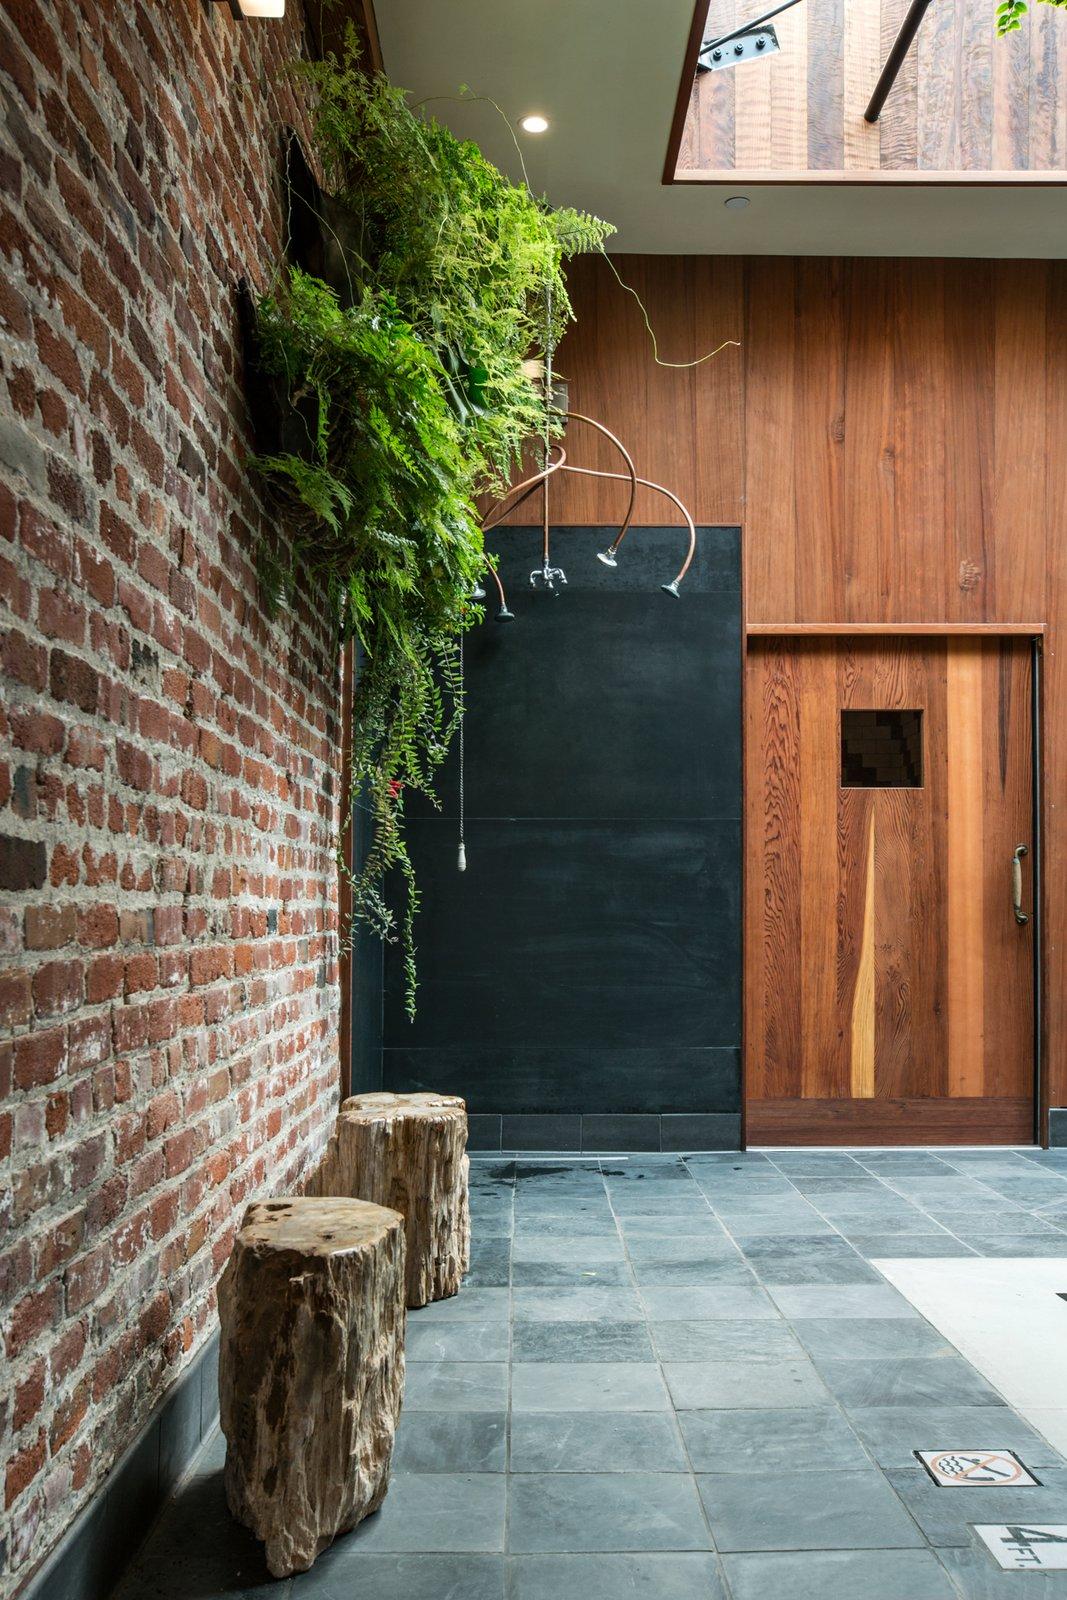 Photo 3 of 14 in Former Auto Body Shop Transformed Into Zen Bathhouse